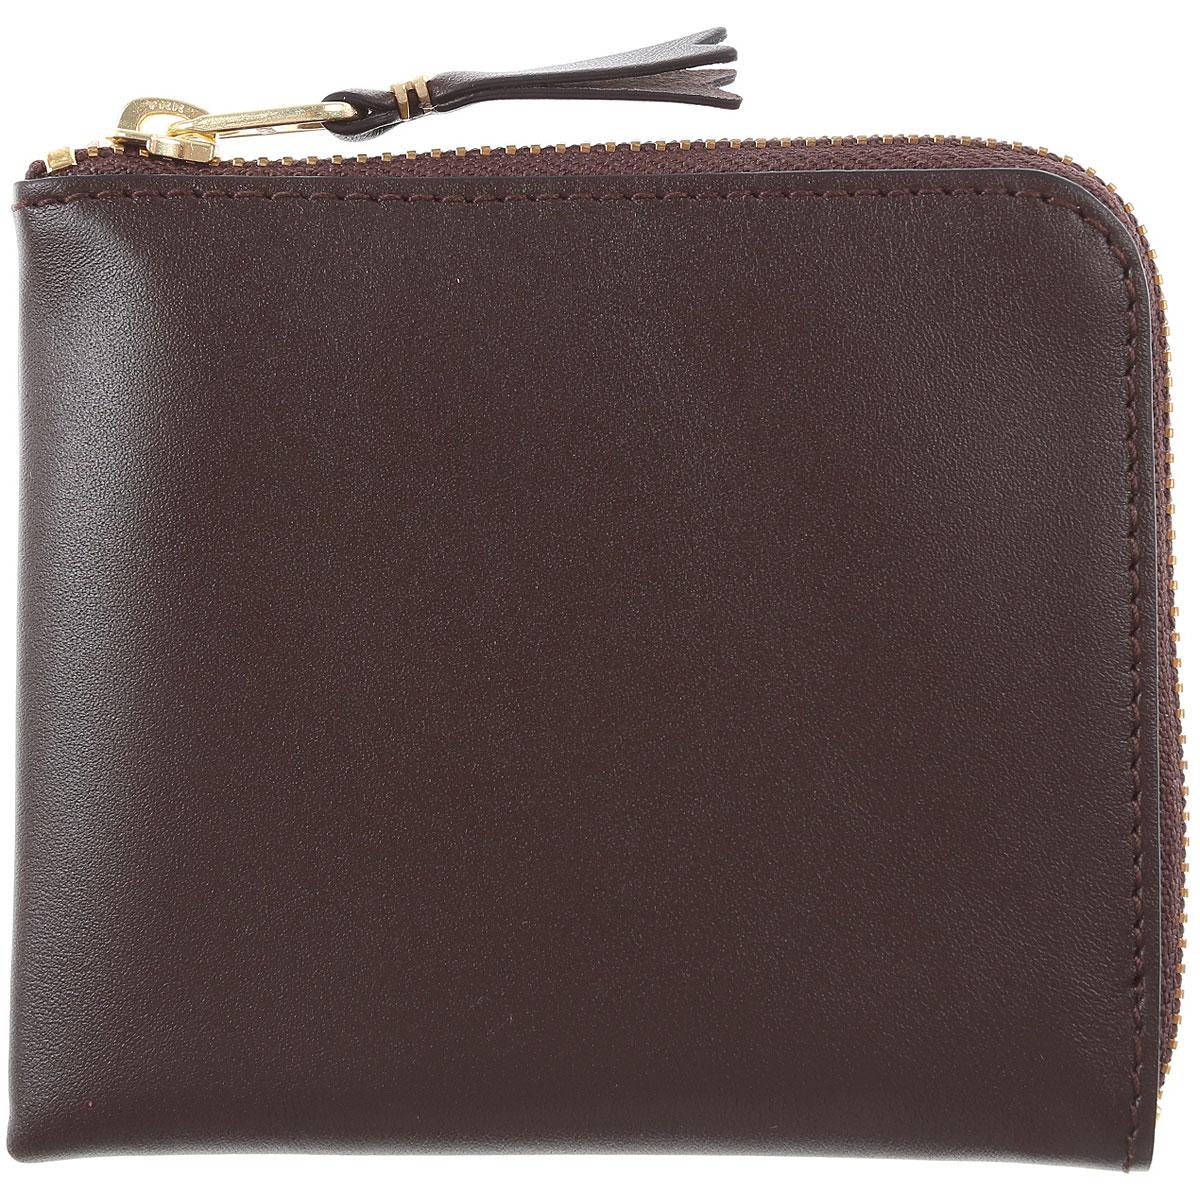 Comme des Garcons Wallet for Men On Sale, Brown, Leather, 2019